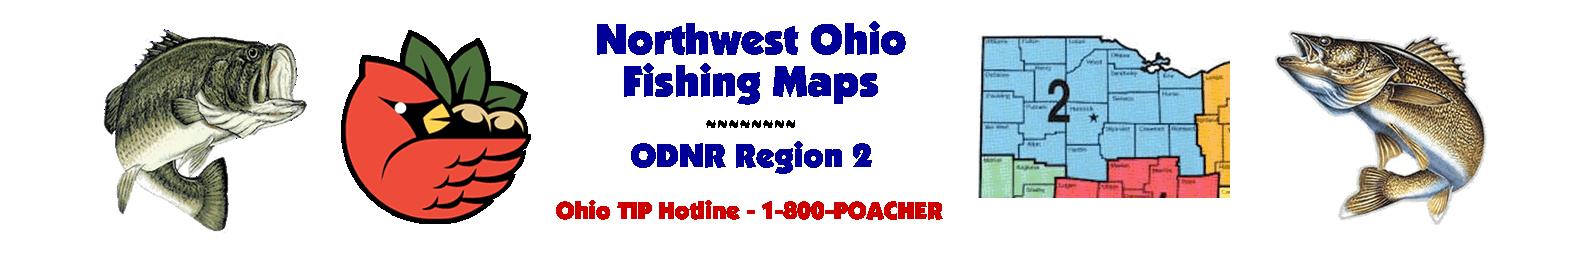 Northwest Ohio Fishing Maps - ODNR Region Two